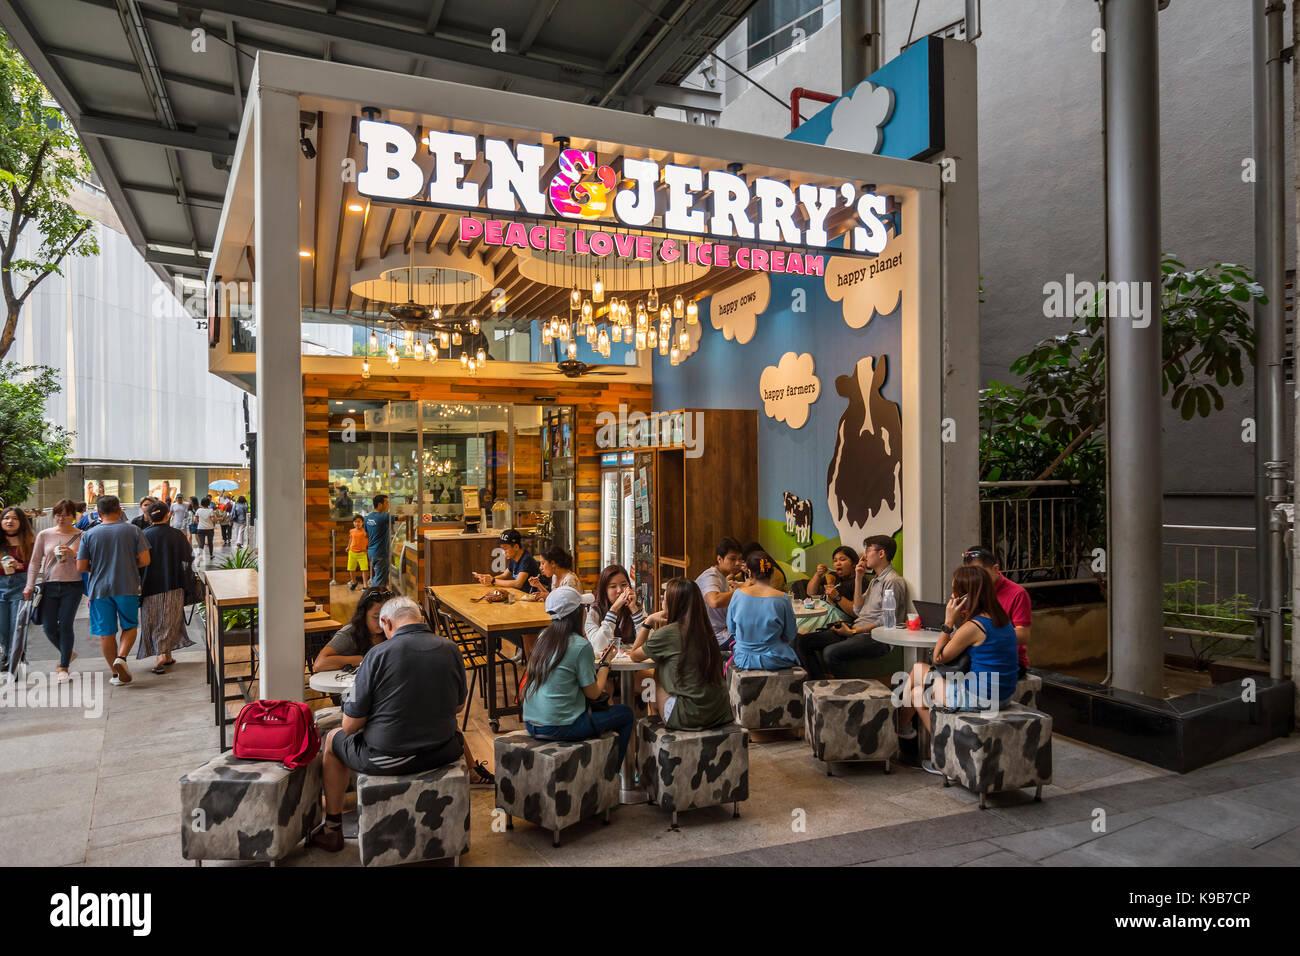 074f309d24 Ben   Jerry s Ice Cream Stand